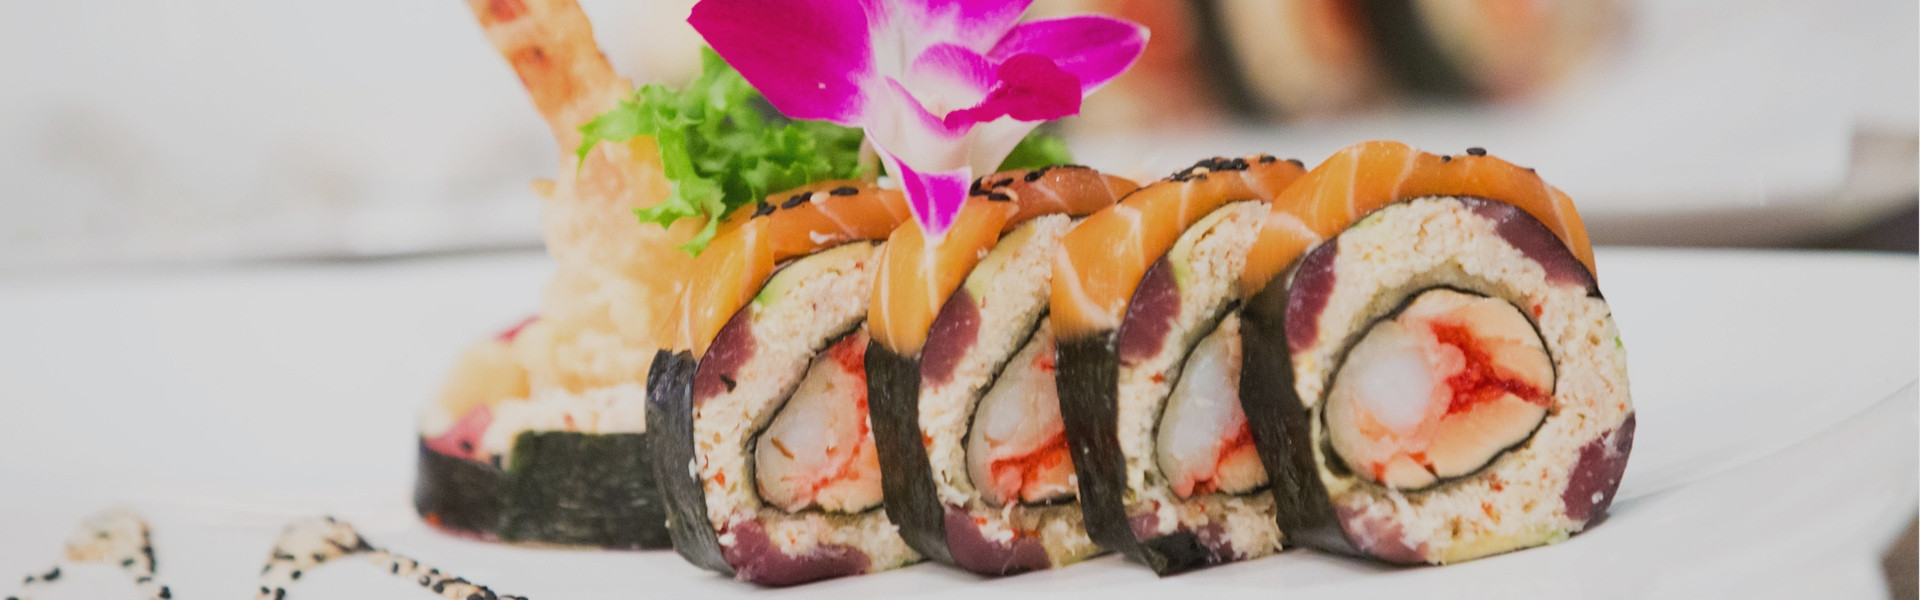 Mikasa Sushi Bar - Centropolis